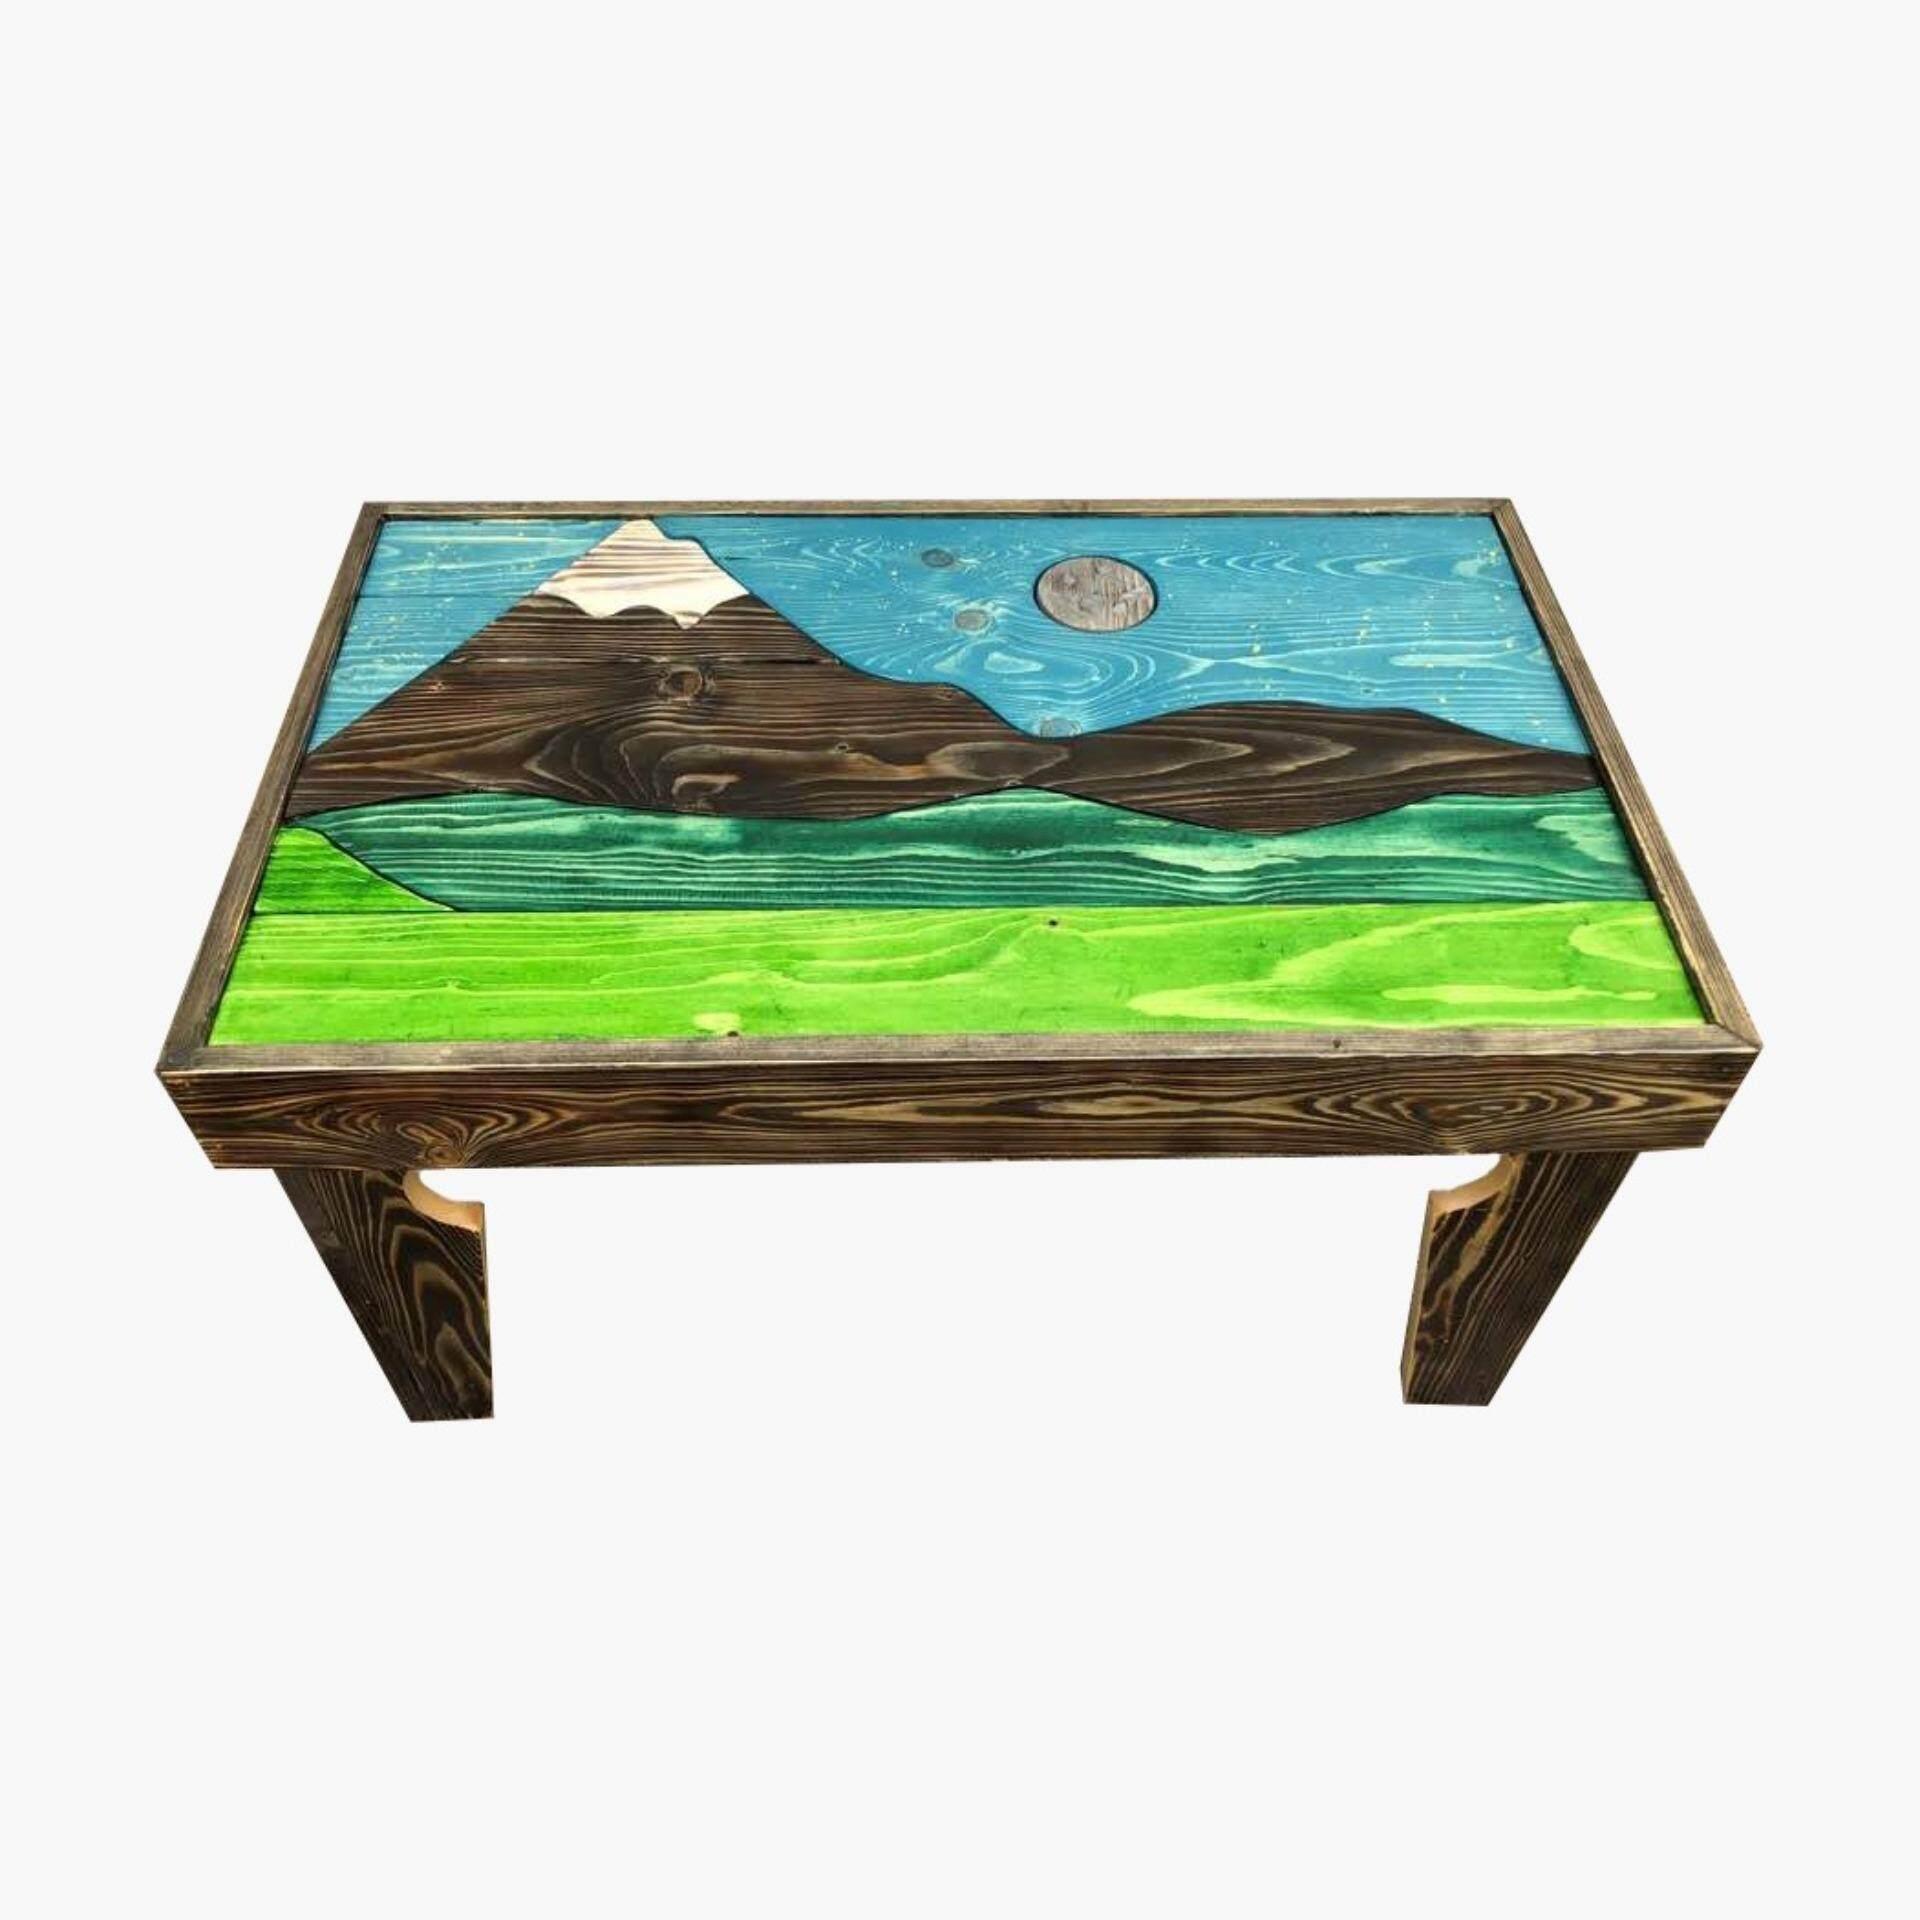 Ladubee Pine Wood Coffee Table (Mount fuji) (3ft x  2ft x 1.5ft)